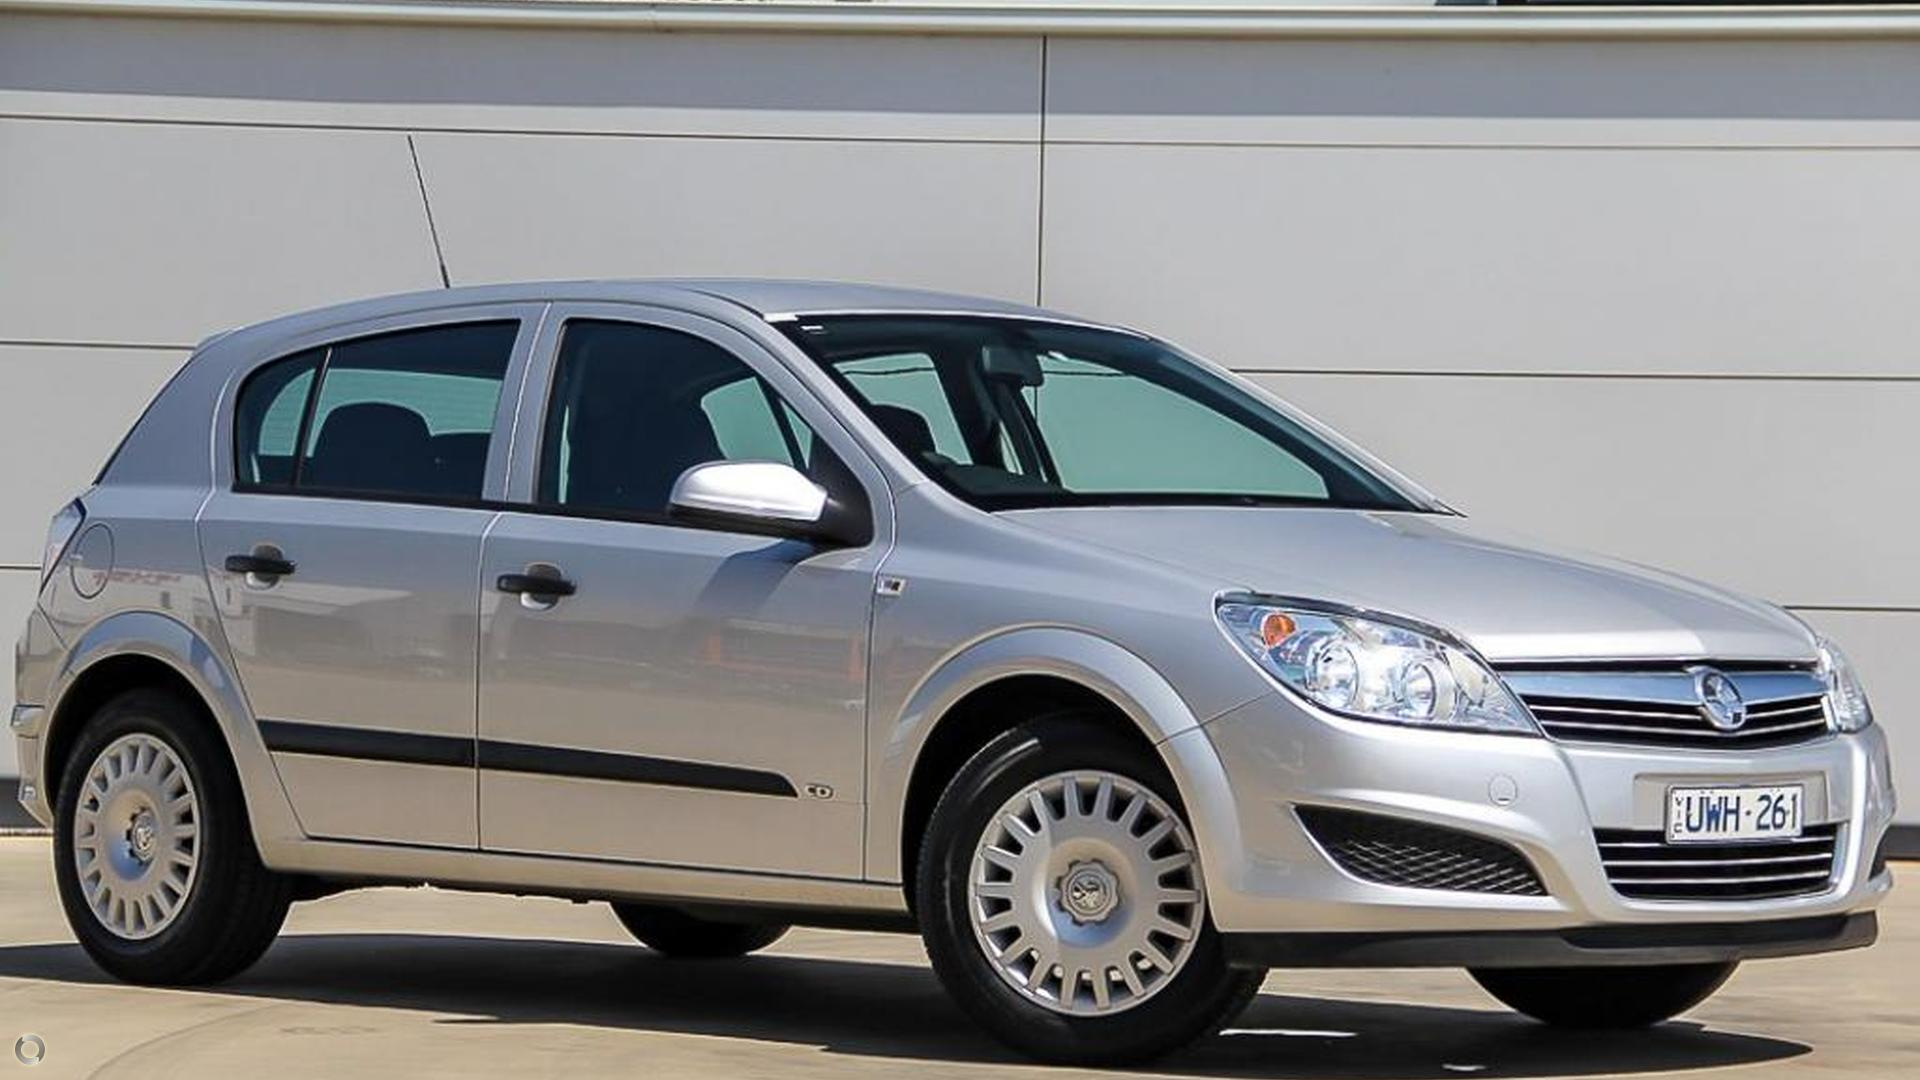 2007 Holden Astra AH